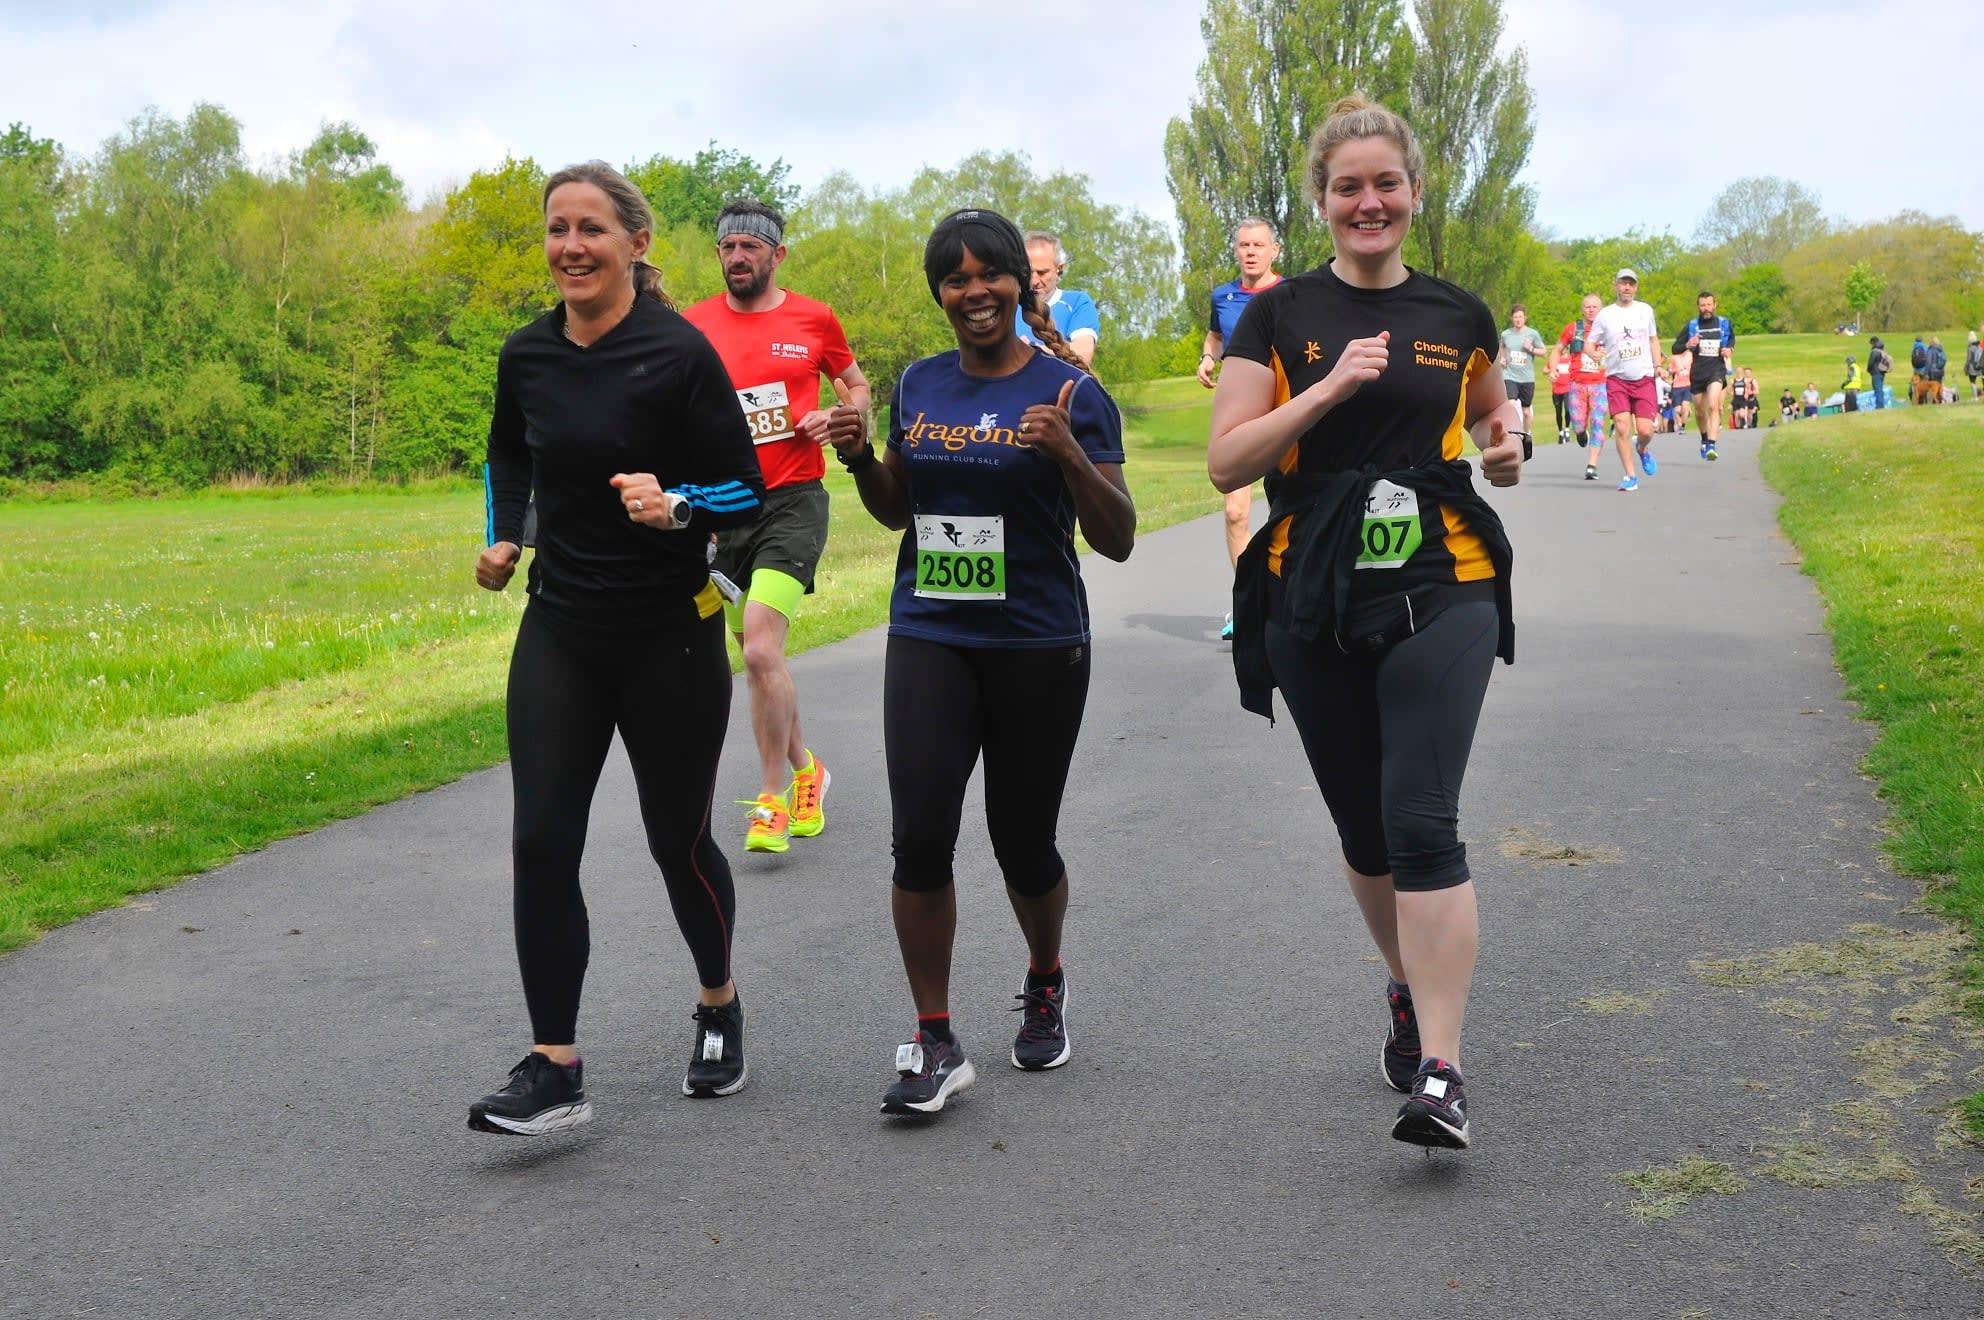 Chase The Sun Heaton Park 5k, 10k & 10 Mile - June